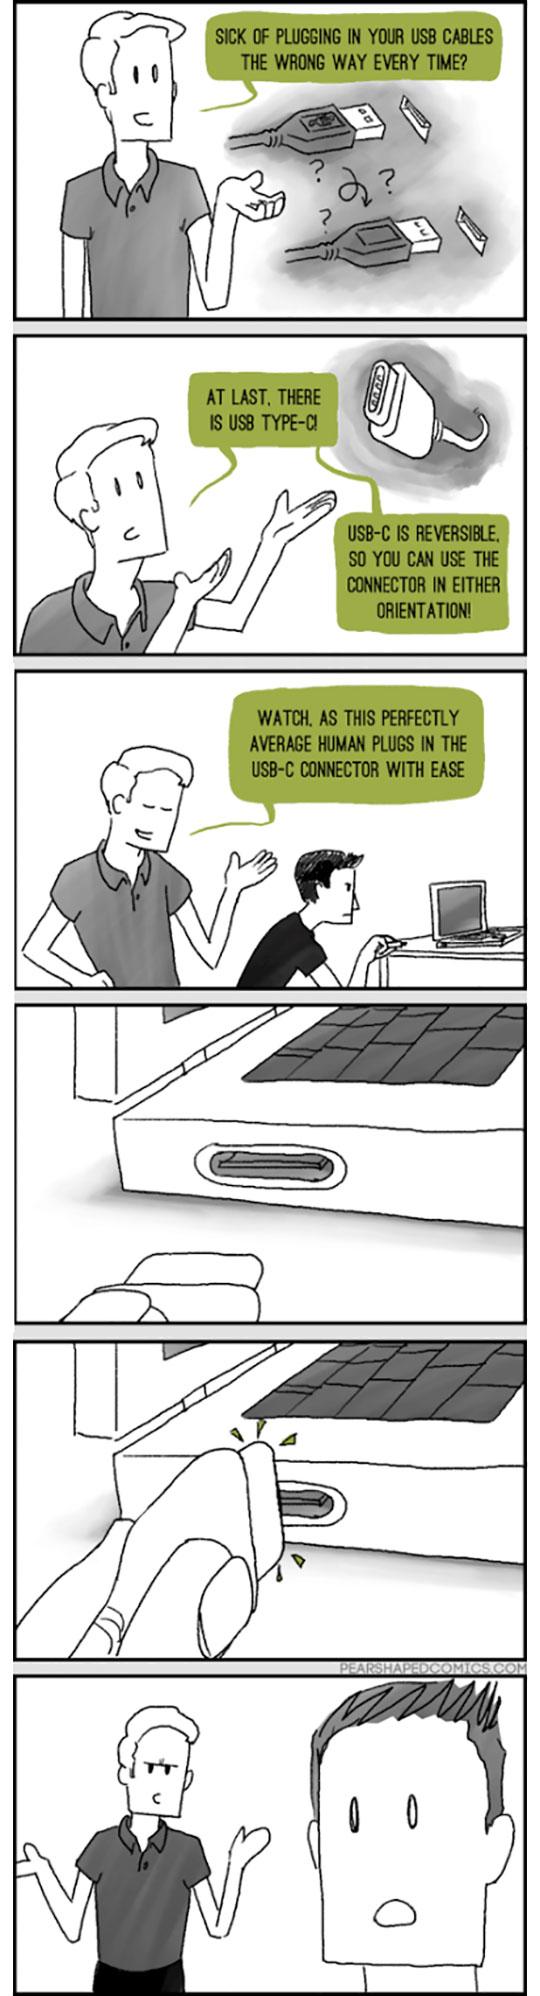 funny-webcomic-USB-C-Mac-plugging-fail